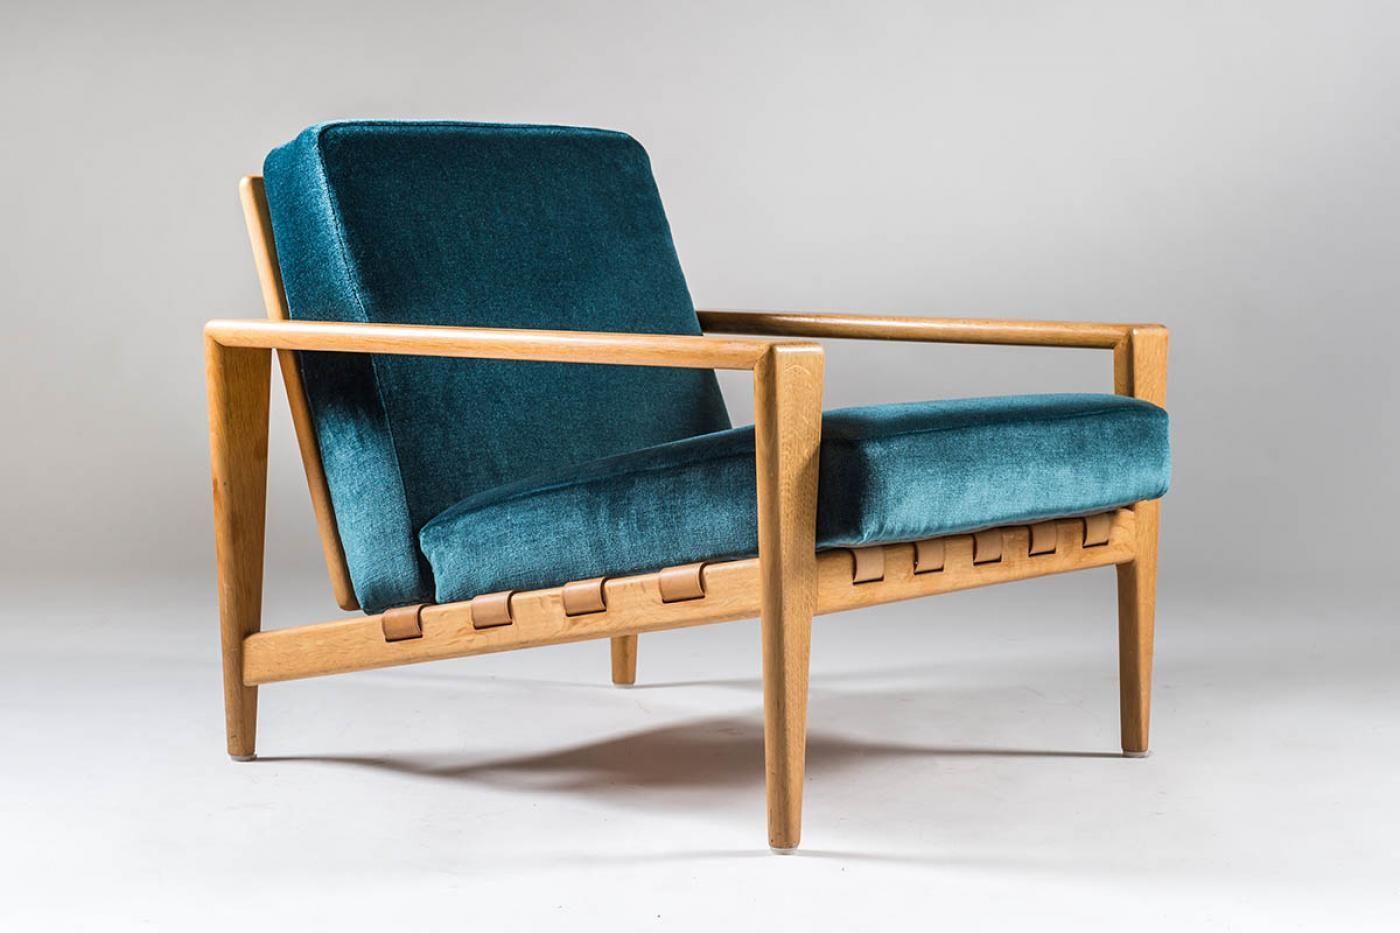 Svante Skogh Scandinavian Mid Century Lounge Chairs Bodo By Svante Skogh Mid Century Lounge Chairs Mid Century Lounge Chair